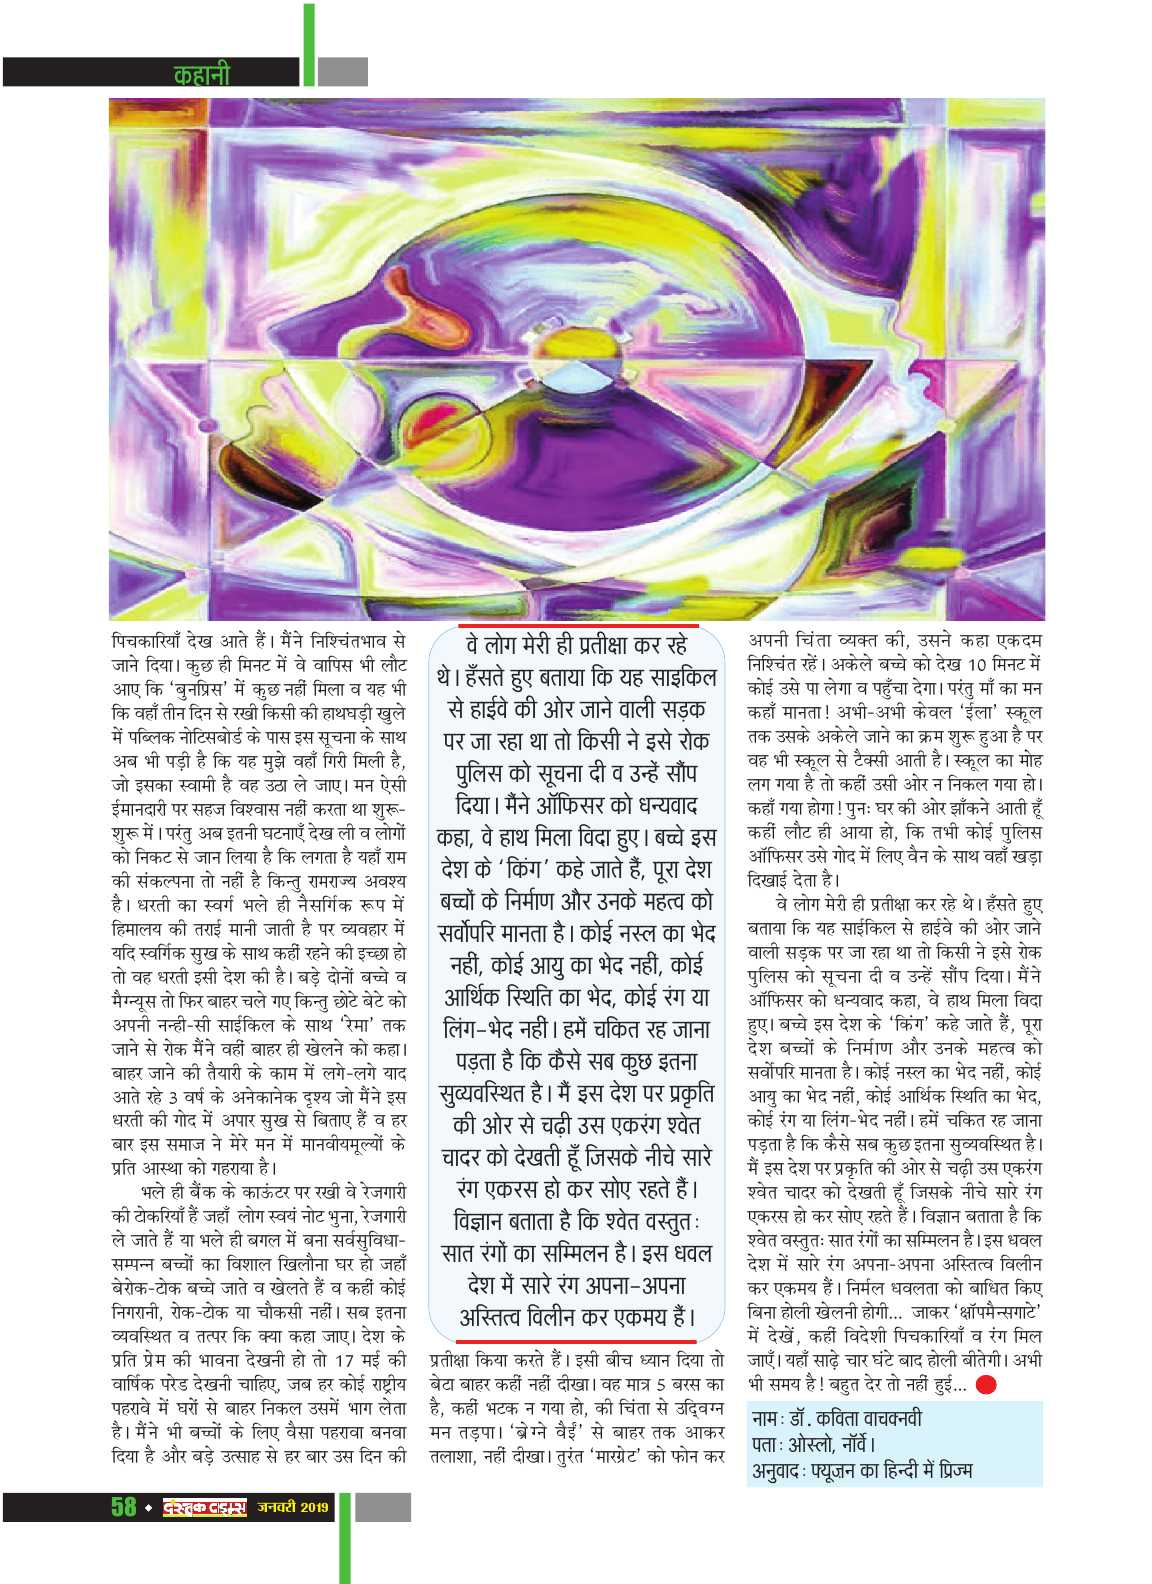 Dastak Times for E-Magazine 15 Jan 2019 new60